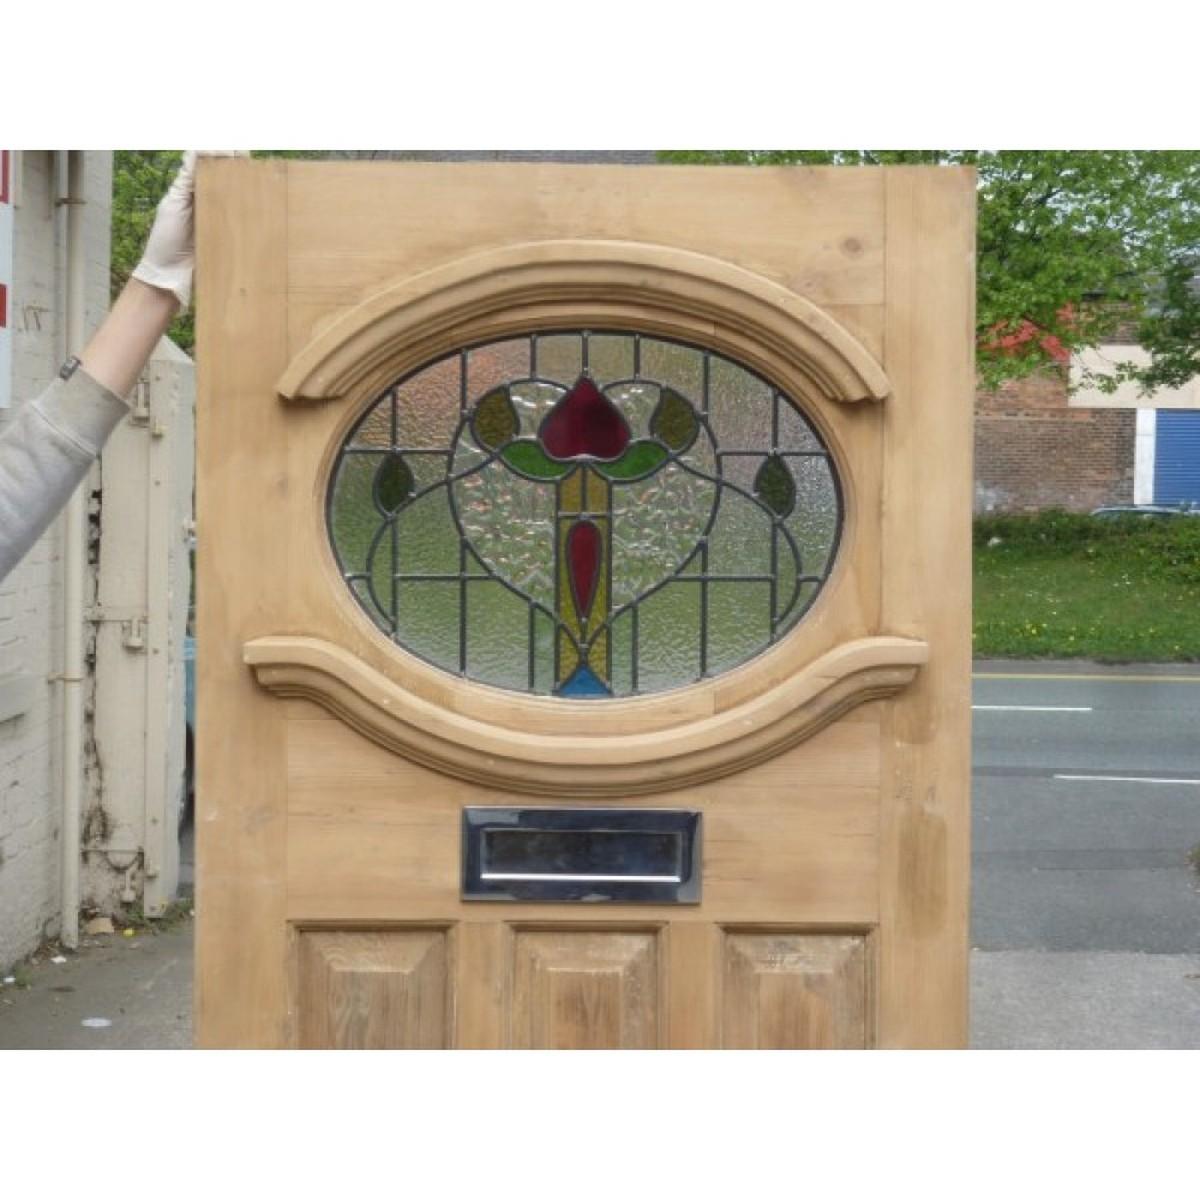 Edwardian Stained Glass Exterior Door 1930u0027s Stained Glass Edwardian stained glass ...  sc 1 st  Secondhand Vintage and Reclaimed & Secondhand Vintage and Reclaimed | Doors and Windows | 1930 ...